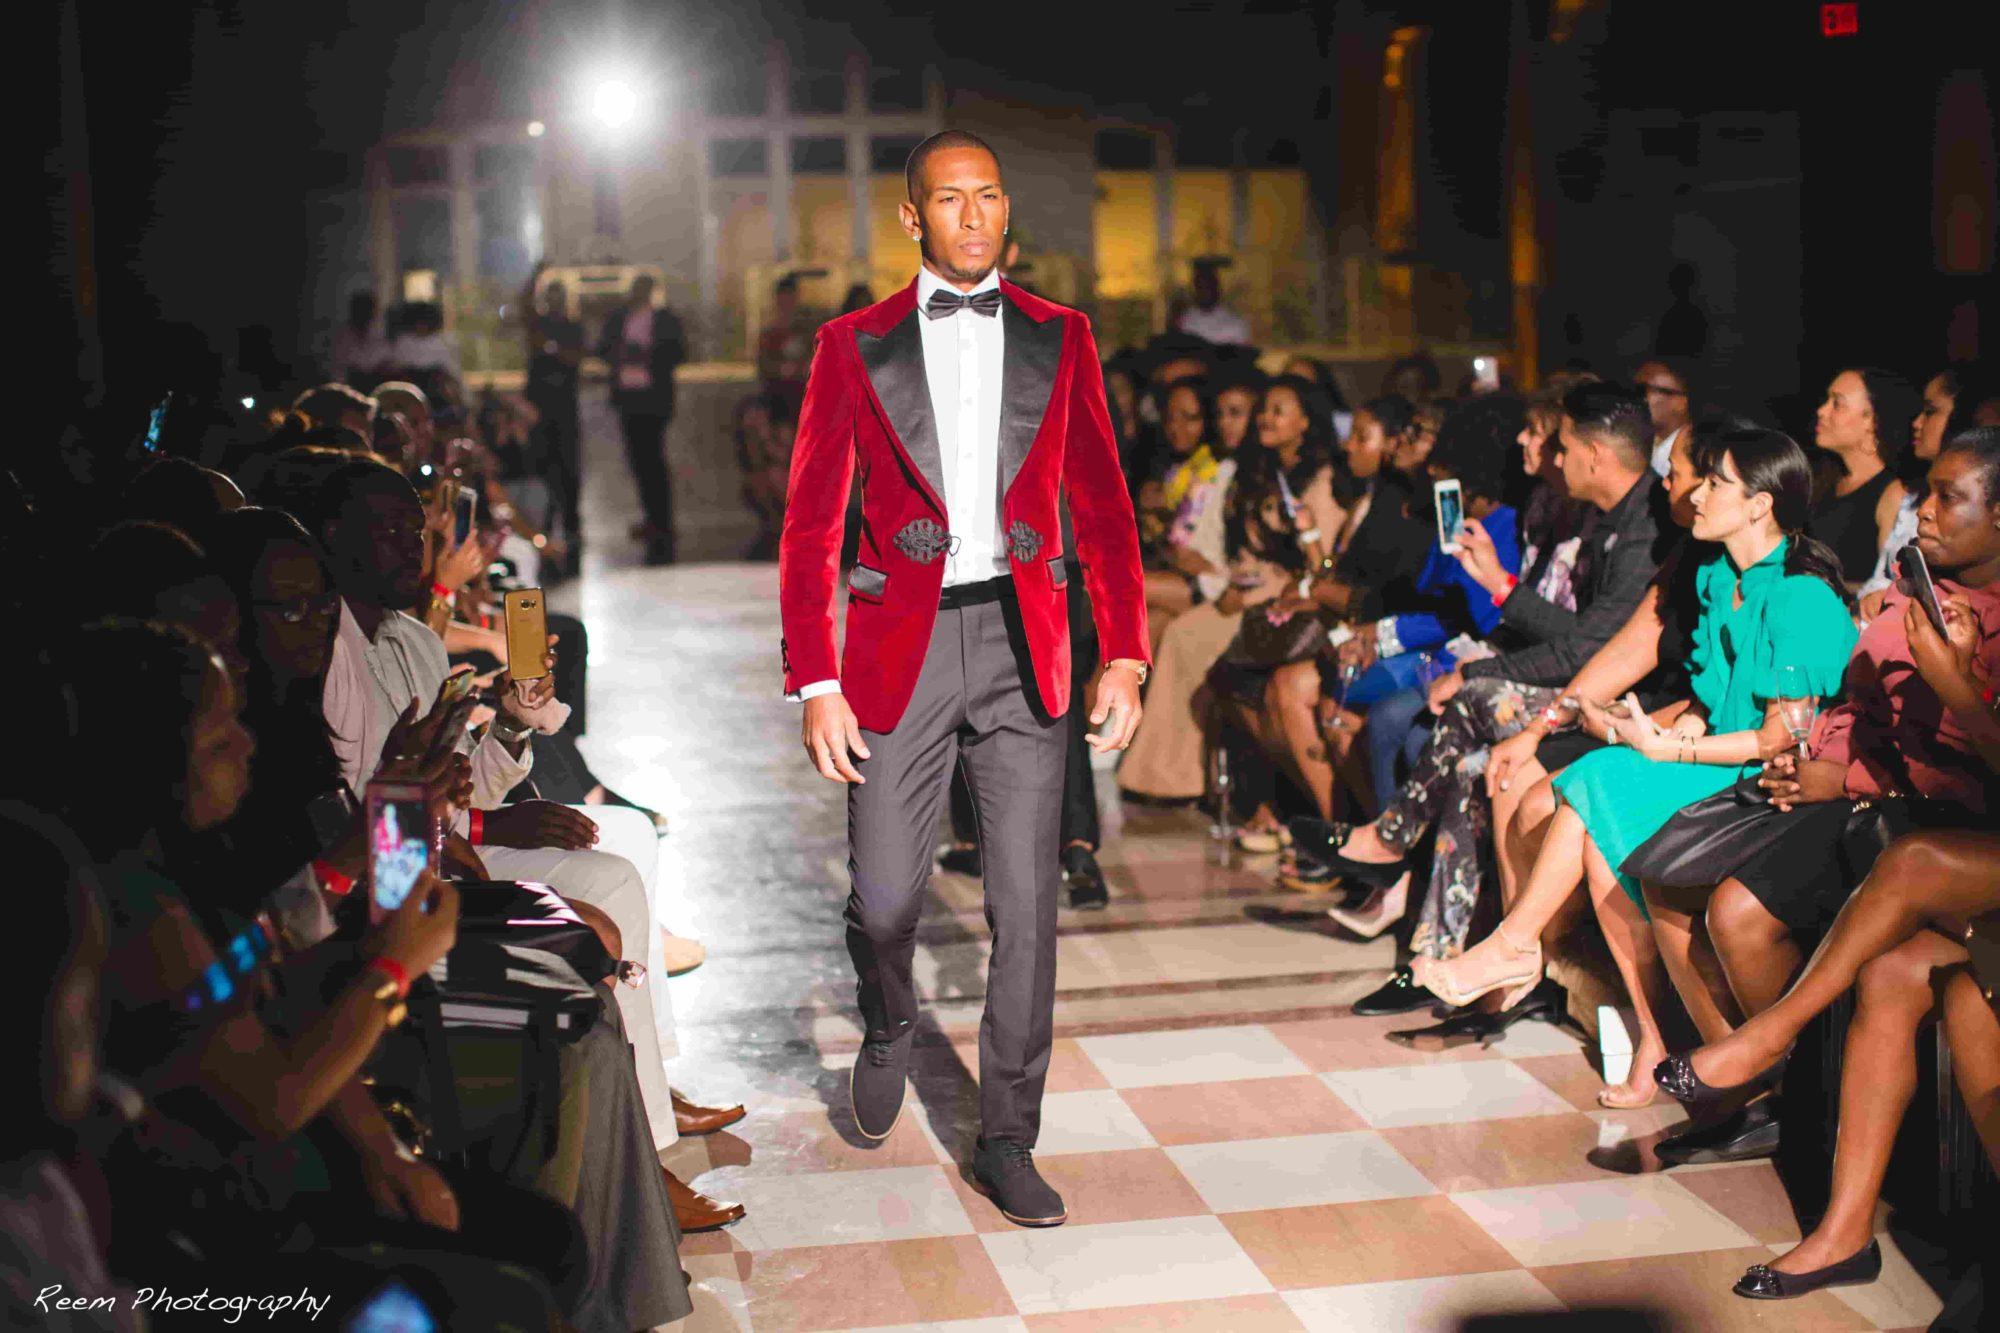 Lighting production fashion runway Miami